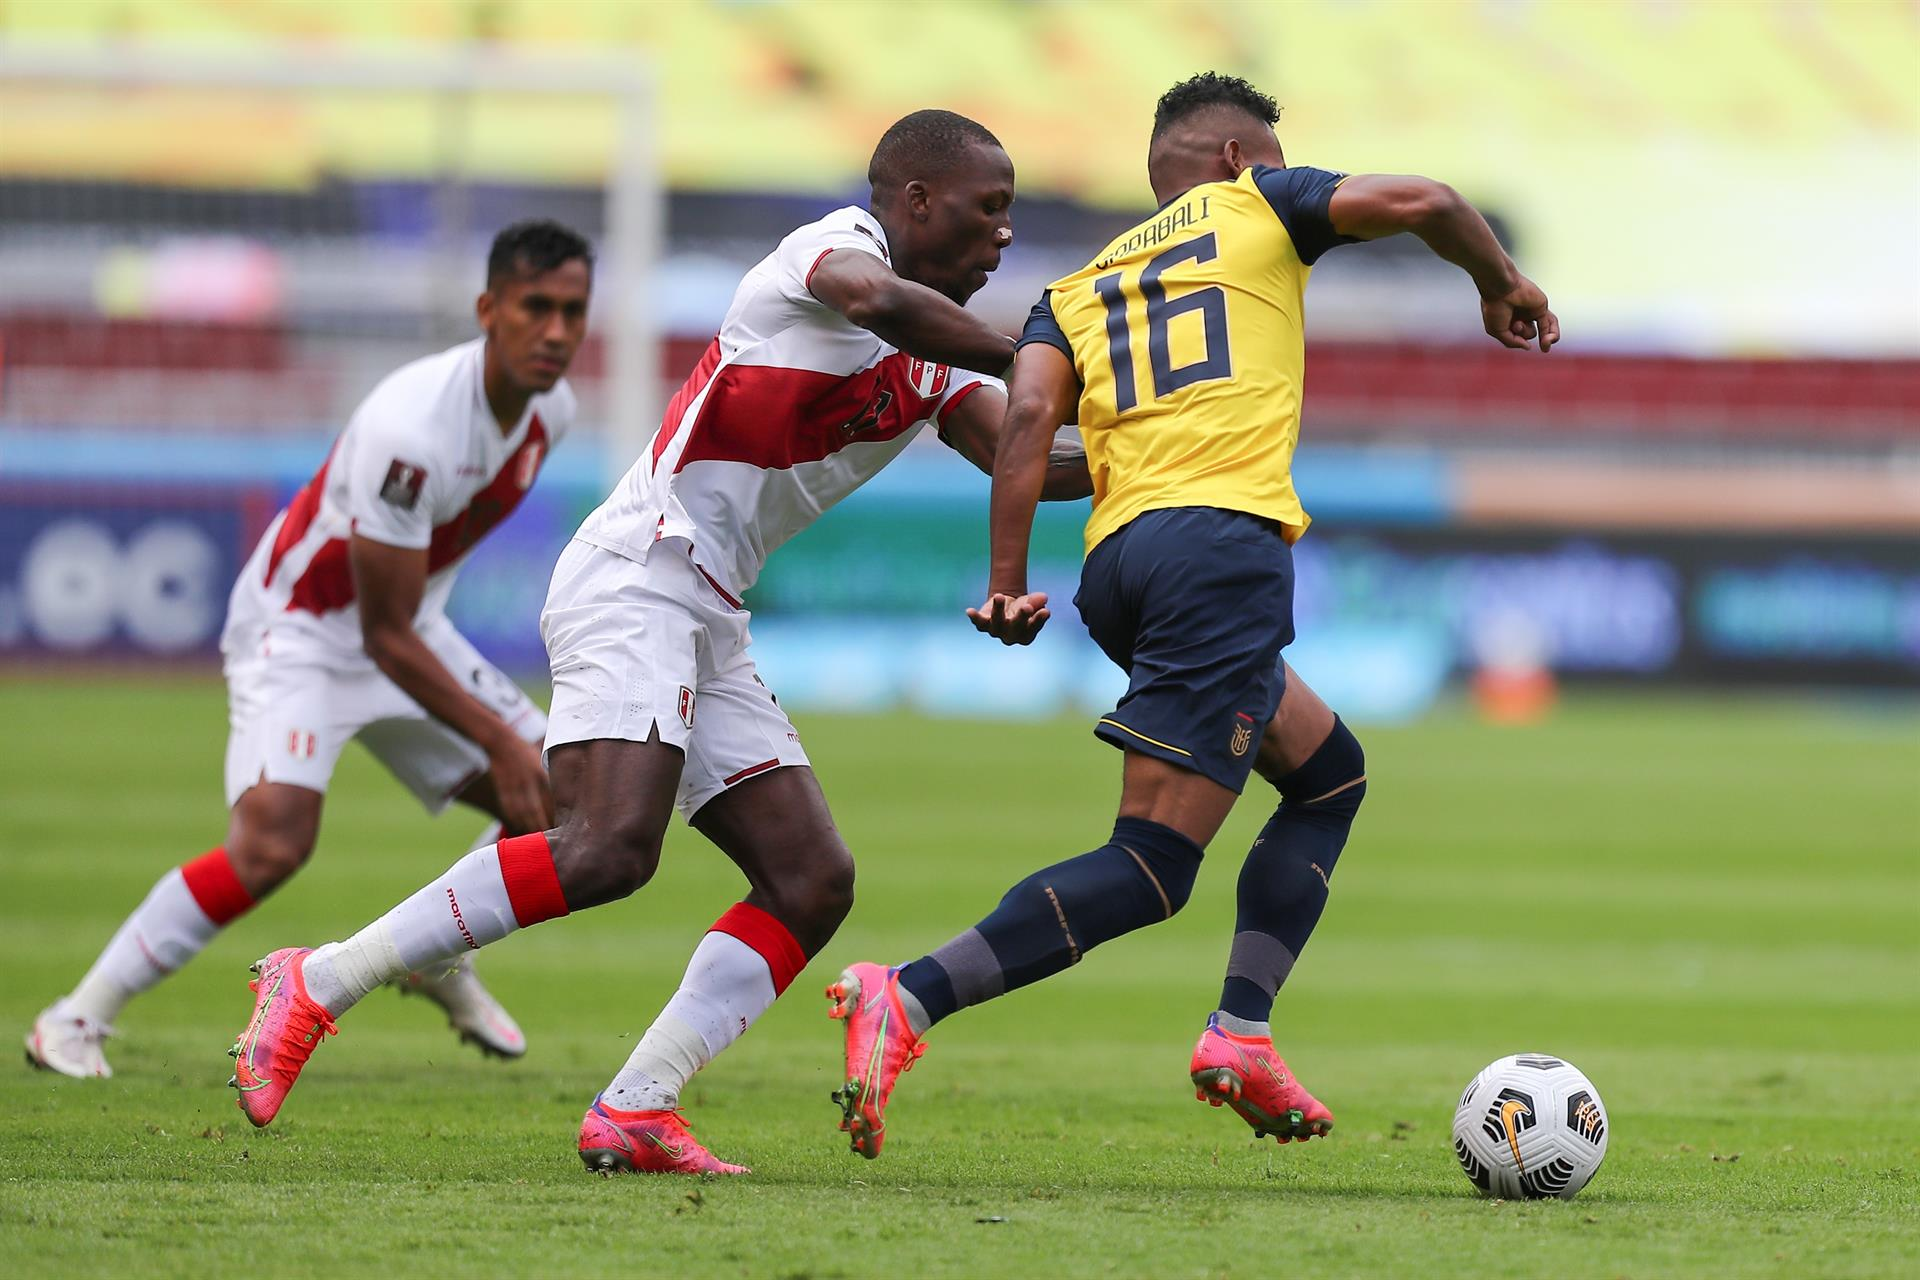 Soi kèo Ecuador vs Peru, 04h00 ngày 24/6, Copa America